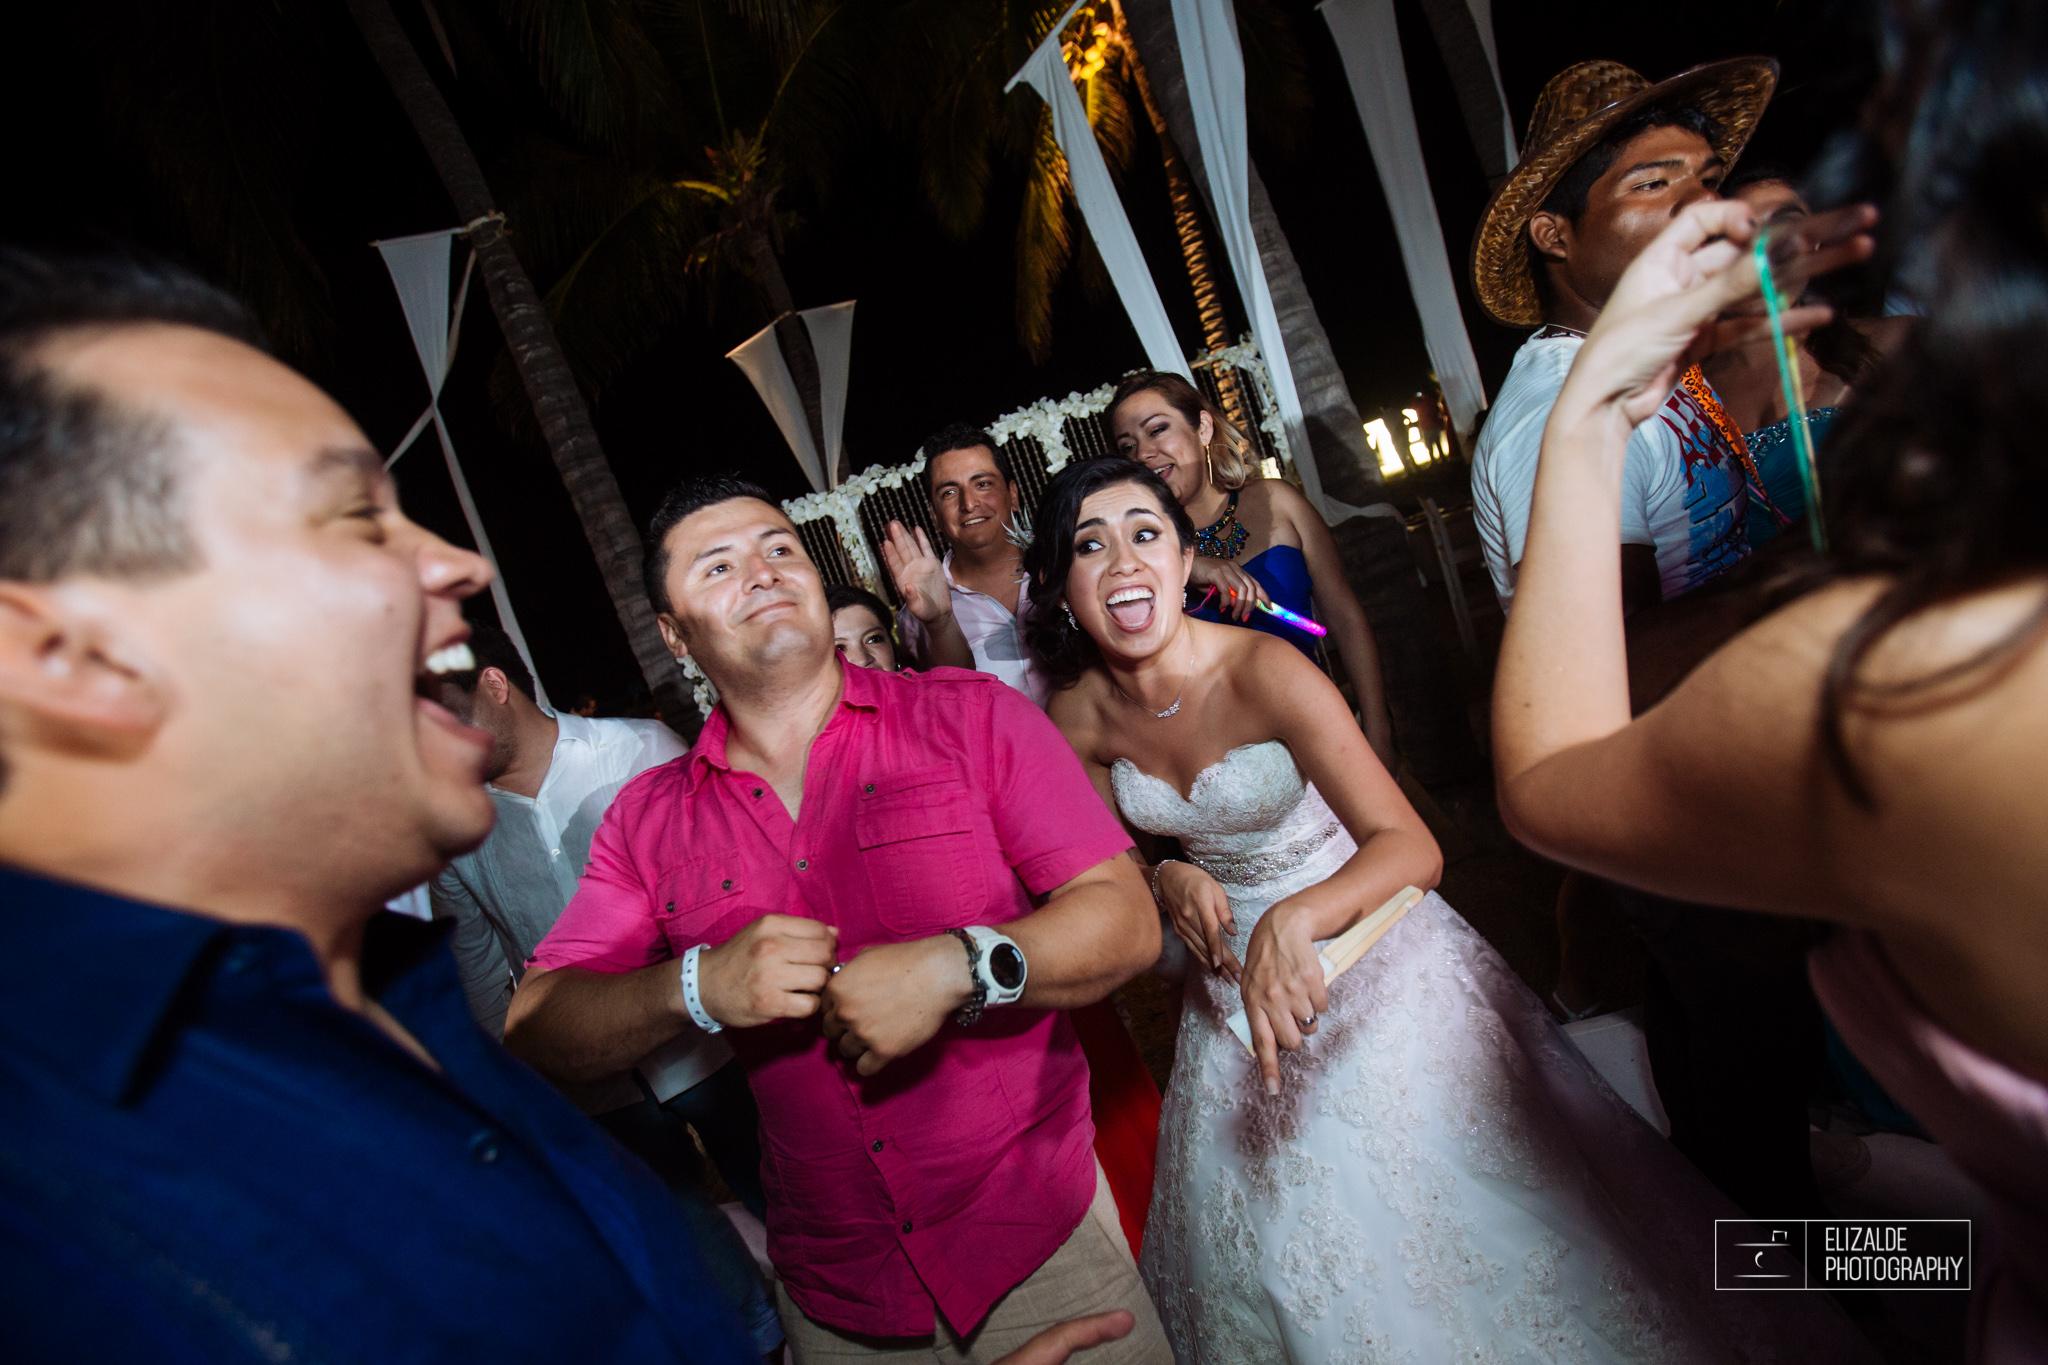 Pay and Ferran_Acapulco_Destination Wedding_Elizalde Photography-121.jpg